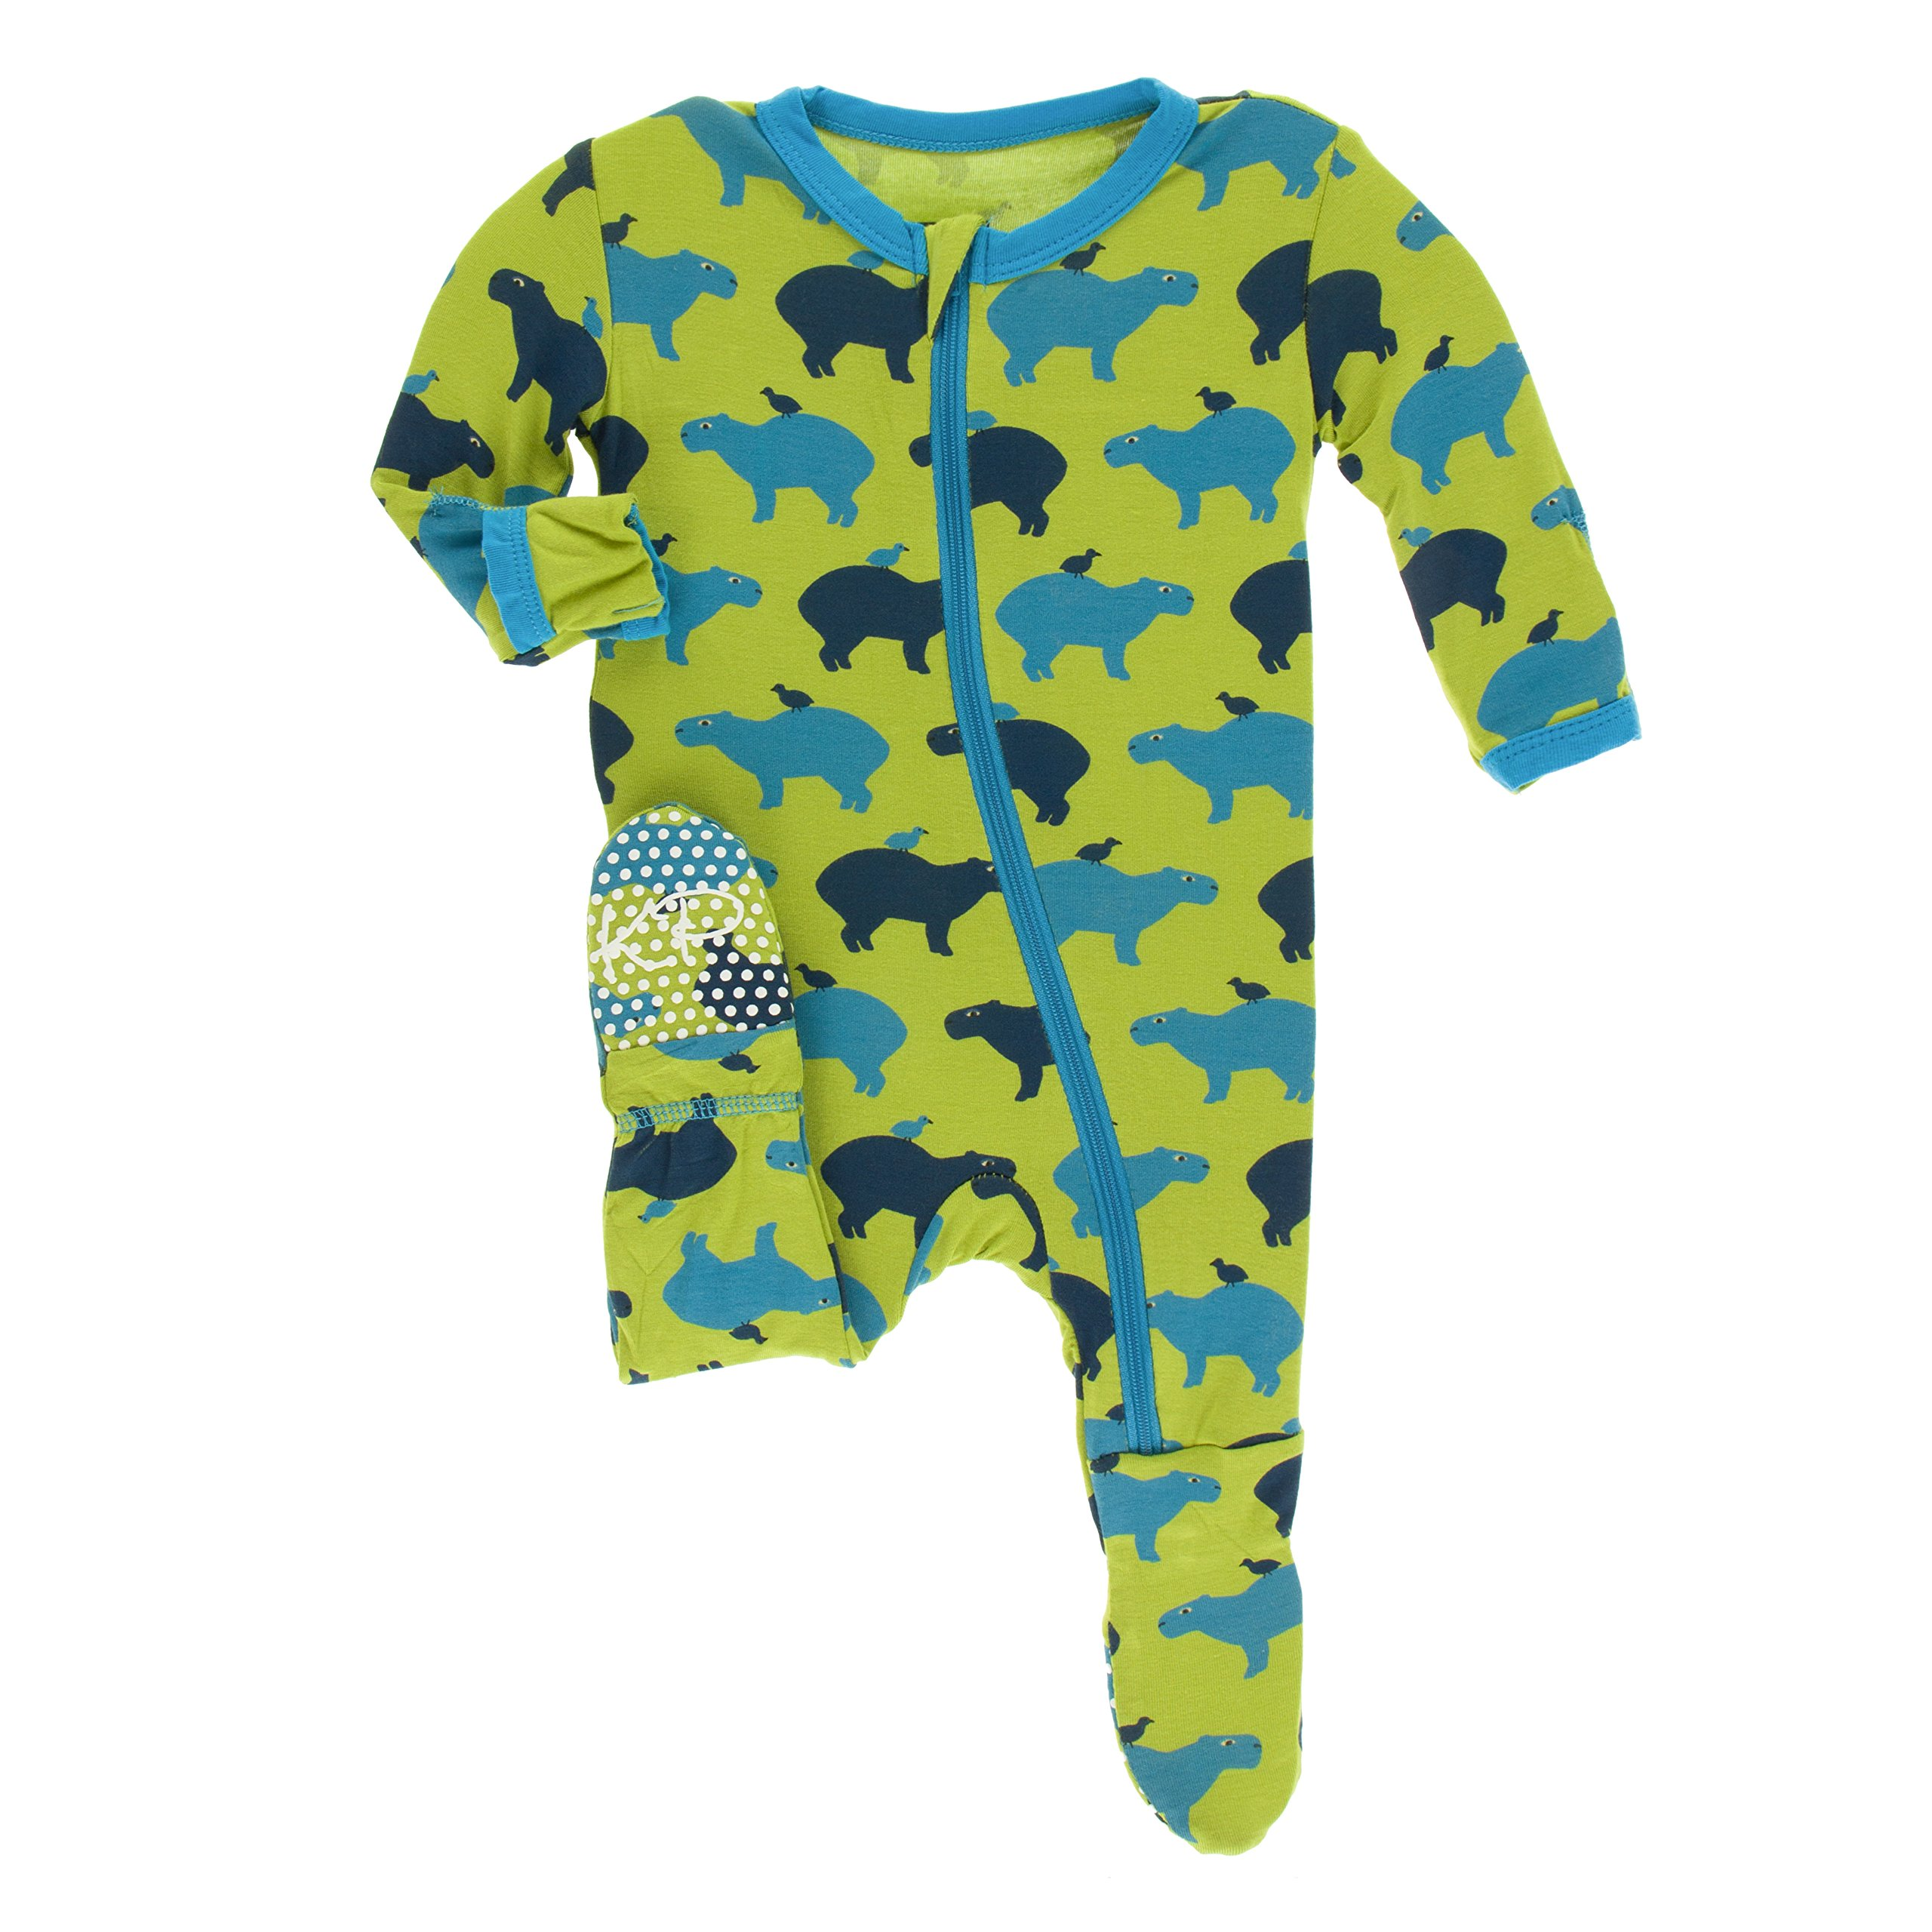 Kickee Pants Little Boys Print Footie with Zipper - Meadow Capybara, Newborn by Kickee Pants (Image #1)